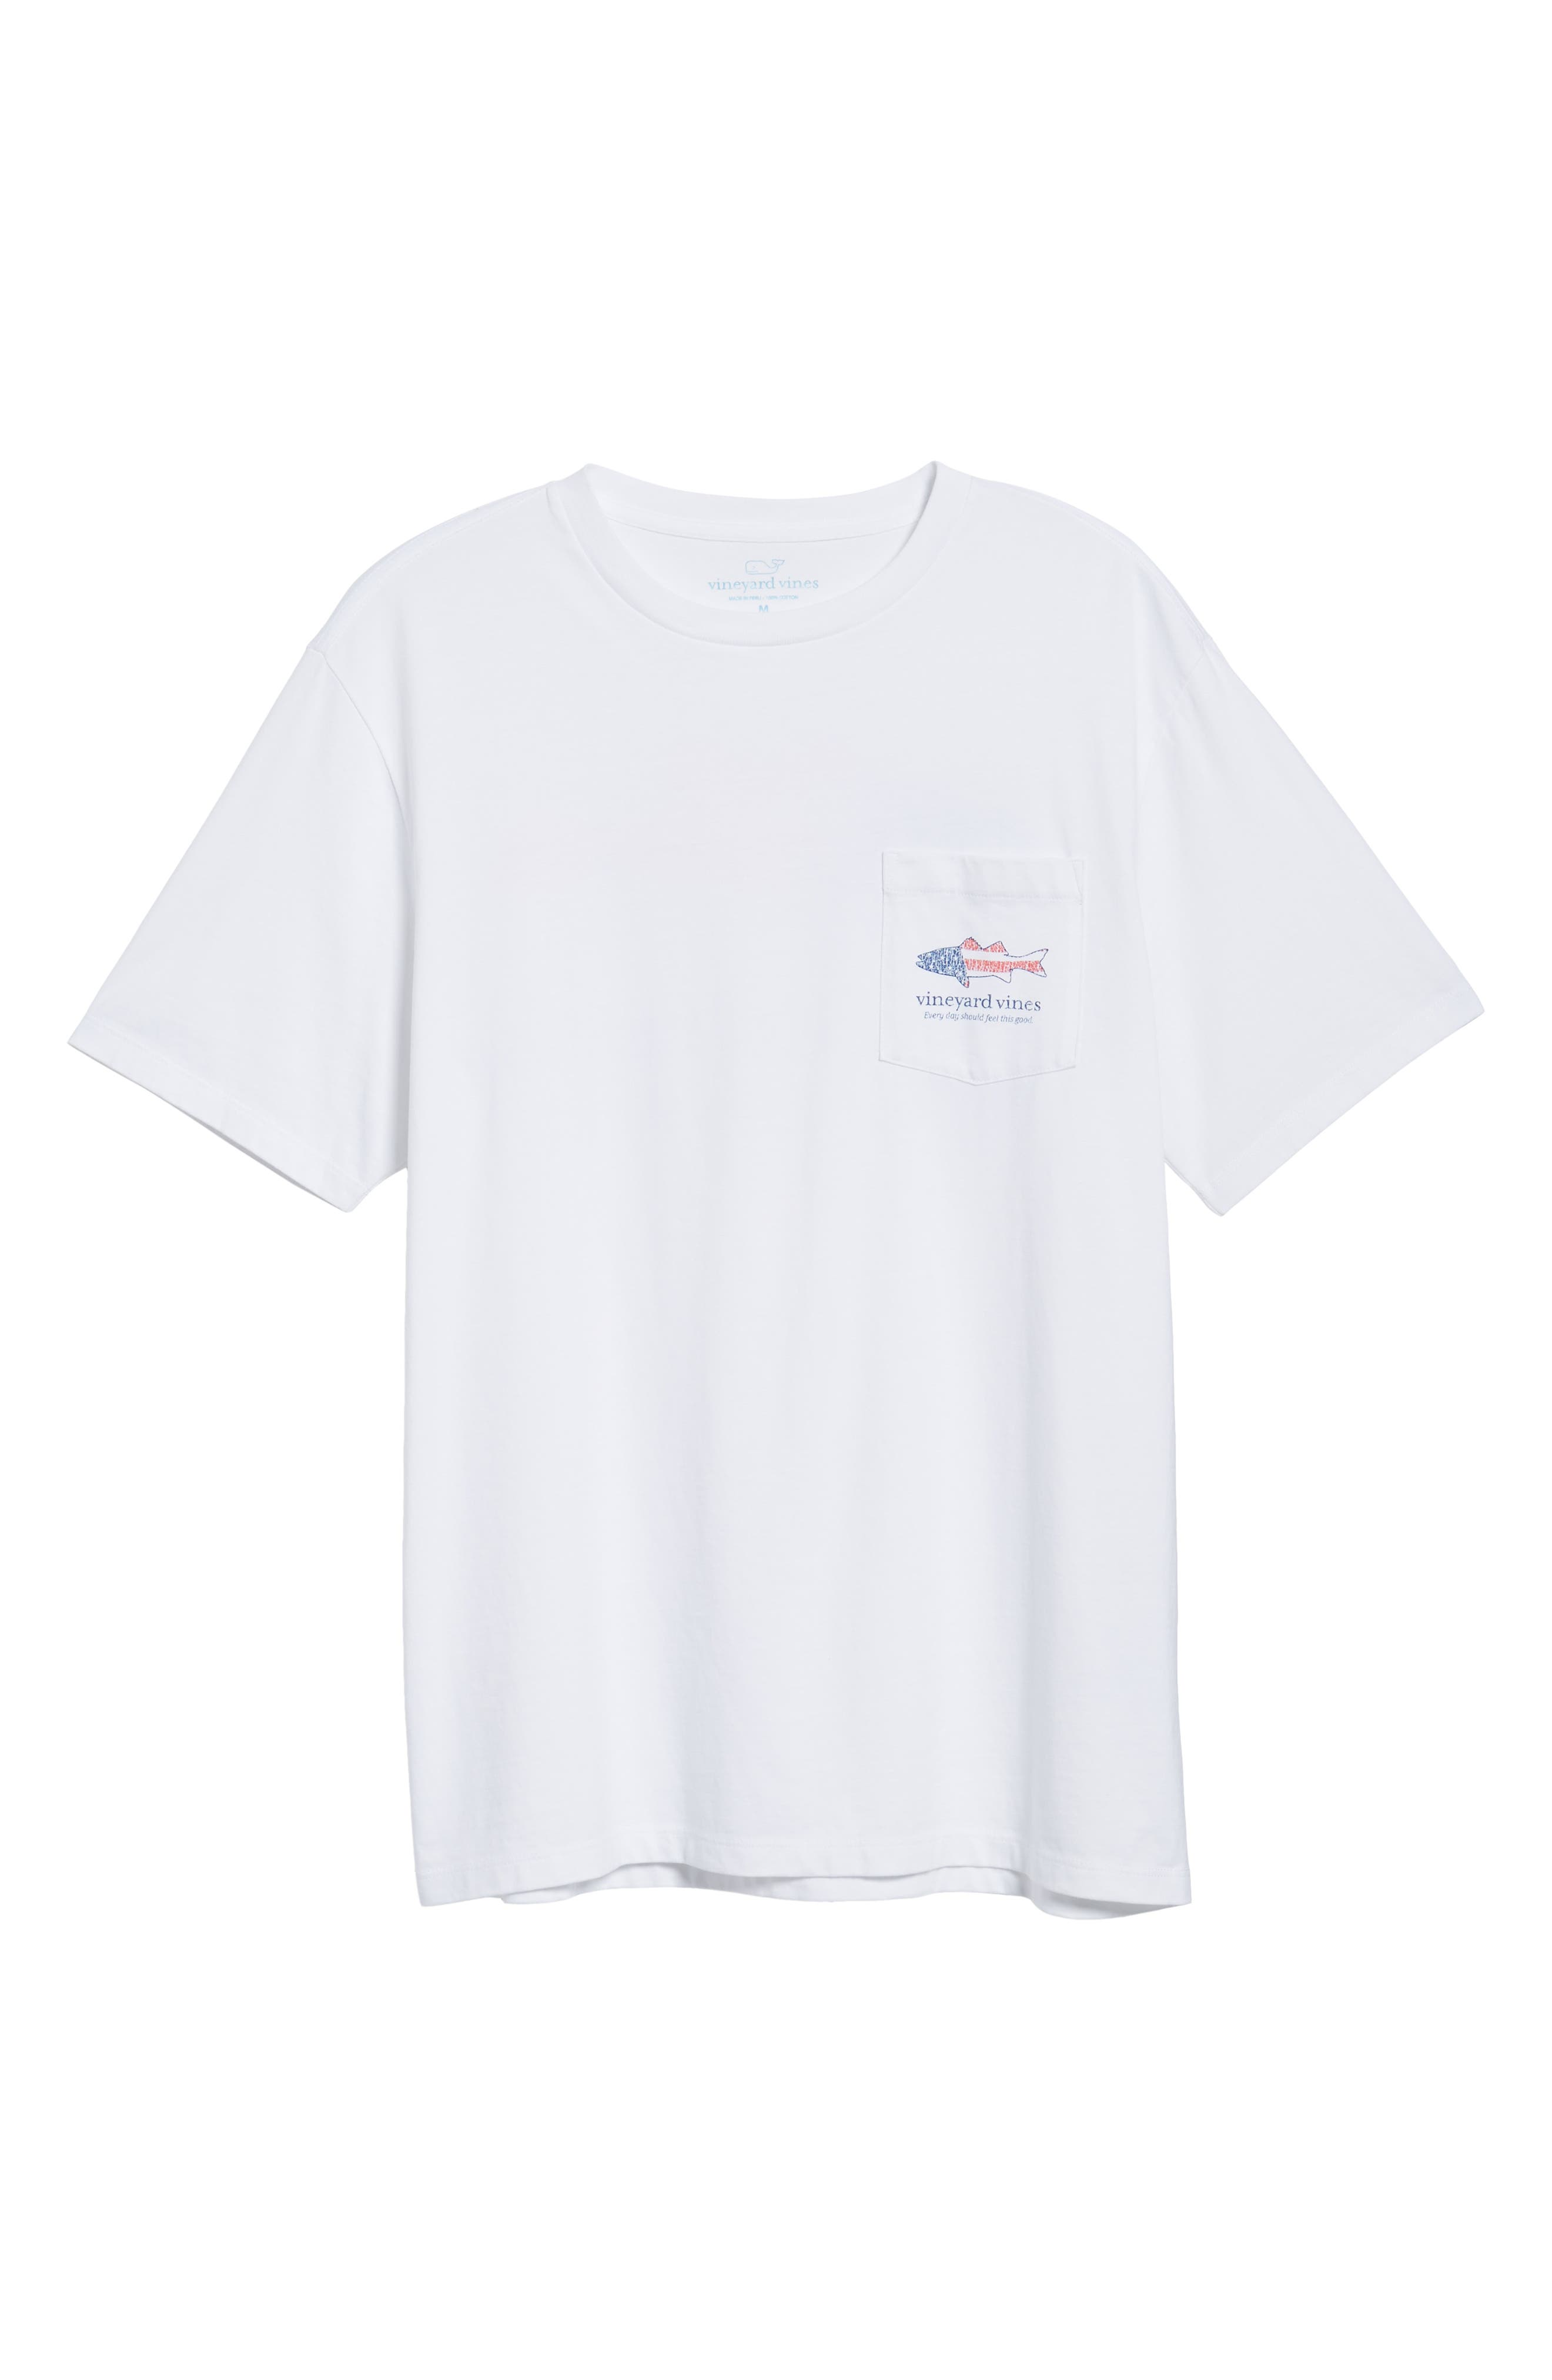 Grouper Flat Crewneck T-Shirt,                             Alternate thumbnail 6, color,                             White Cap